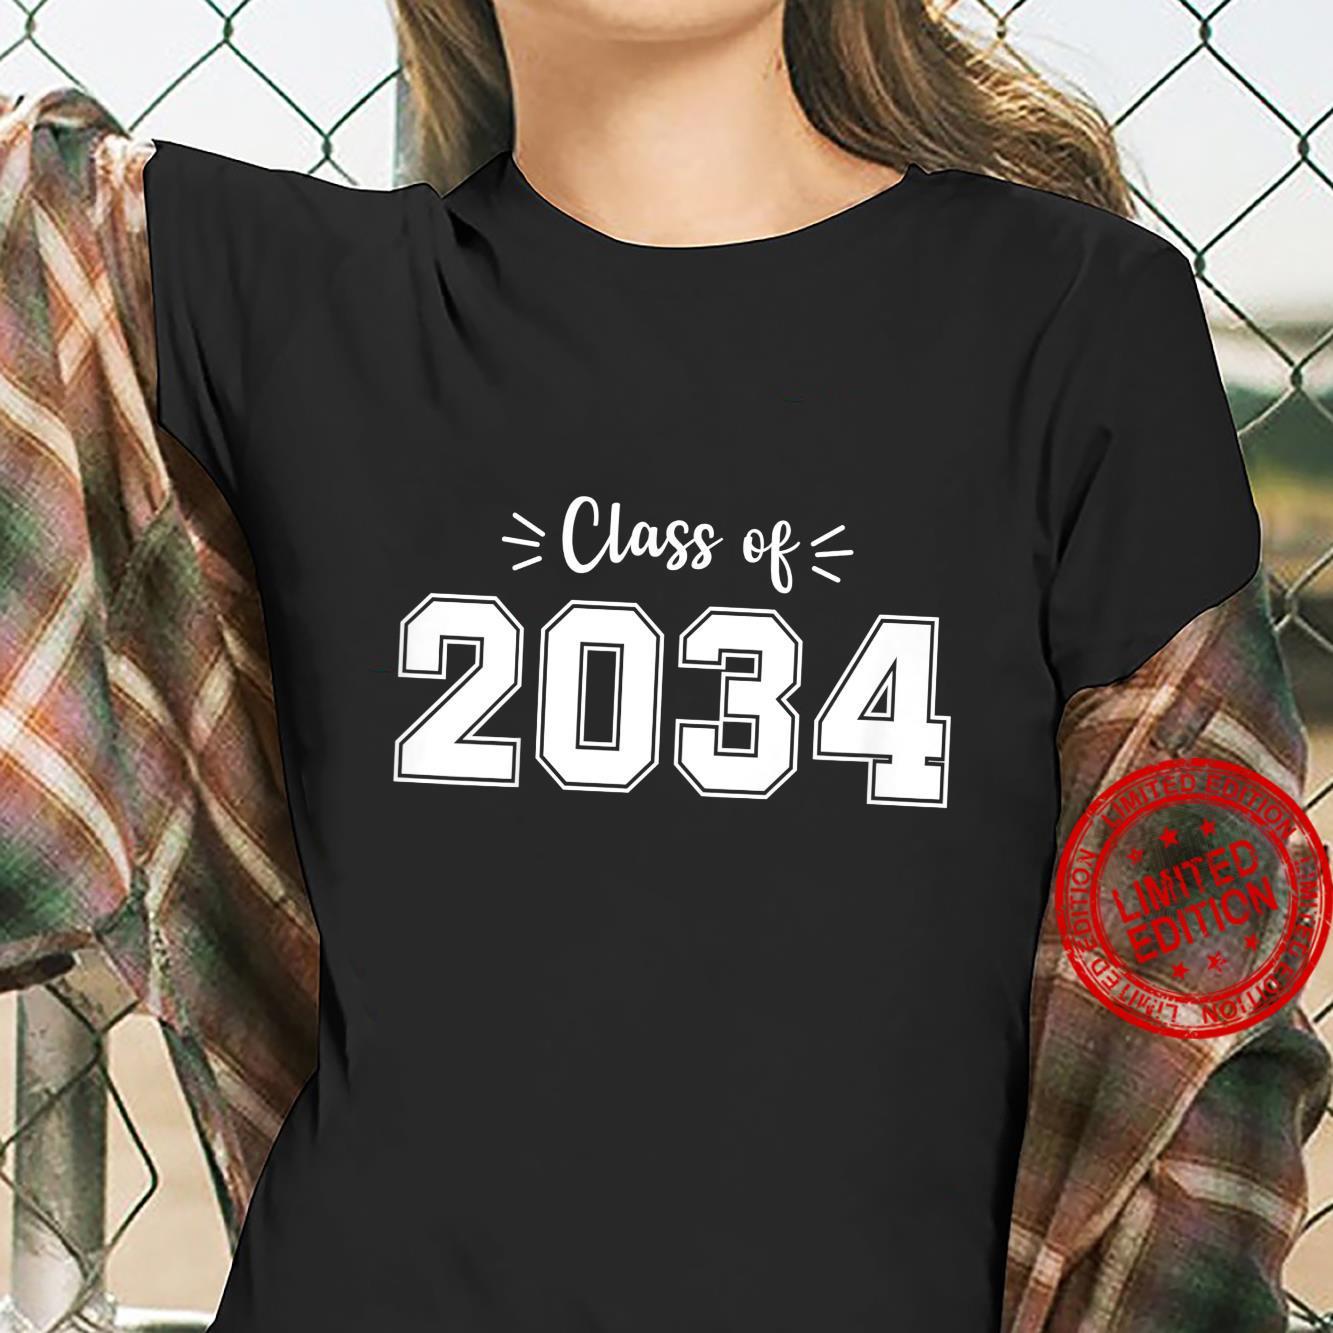 Kids Kindergarten 2021 Class of 2034 grow with me Youth Student Shirt ladies tee